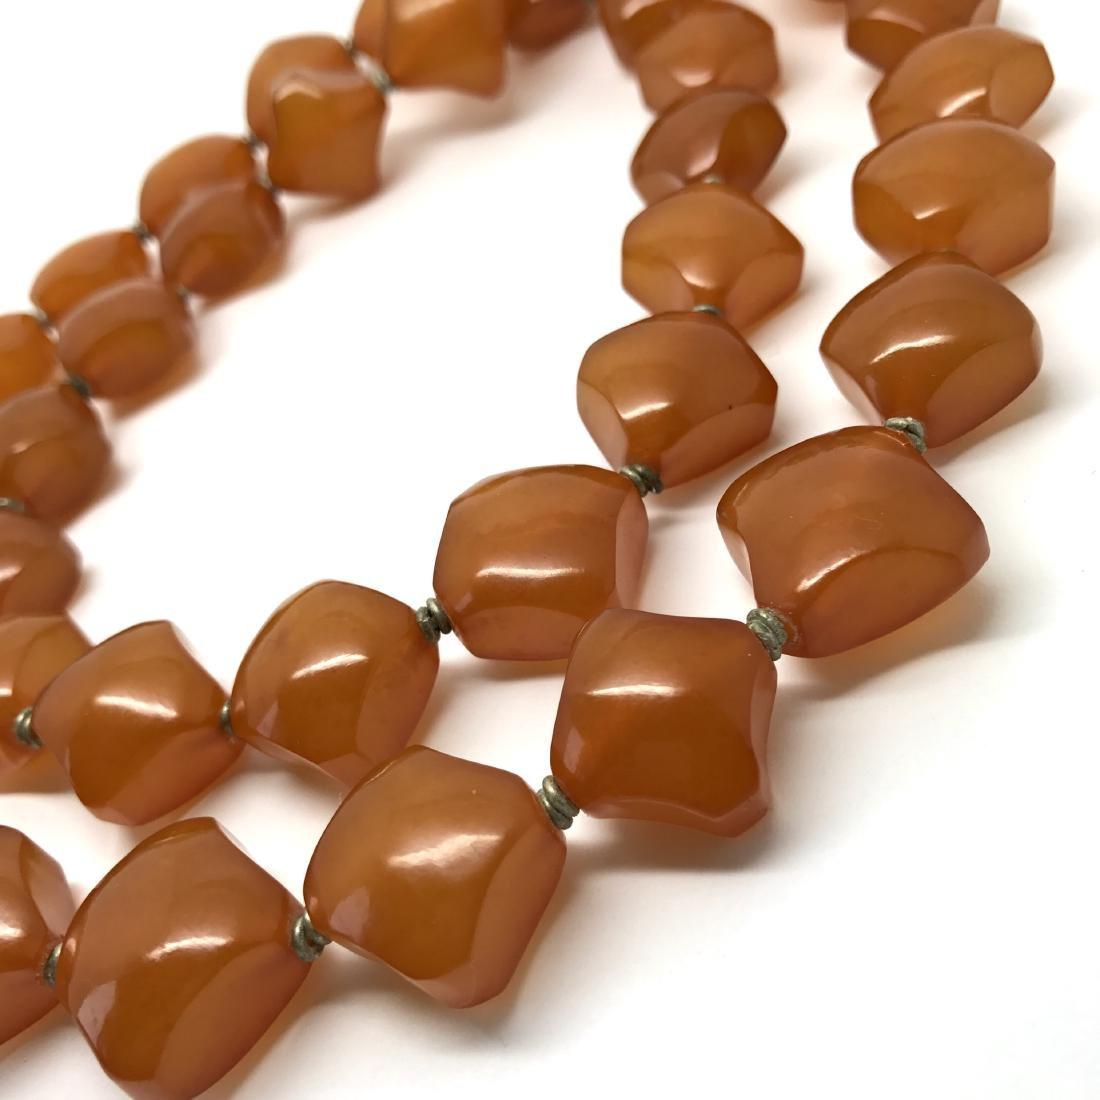 Old Baltic Amber Vintage Necklace Butterscotch Cognac - 3